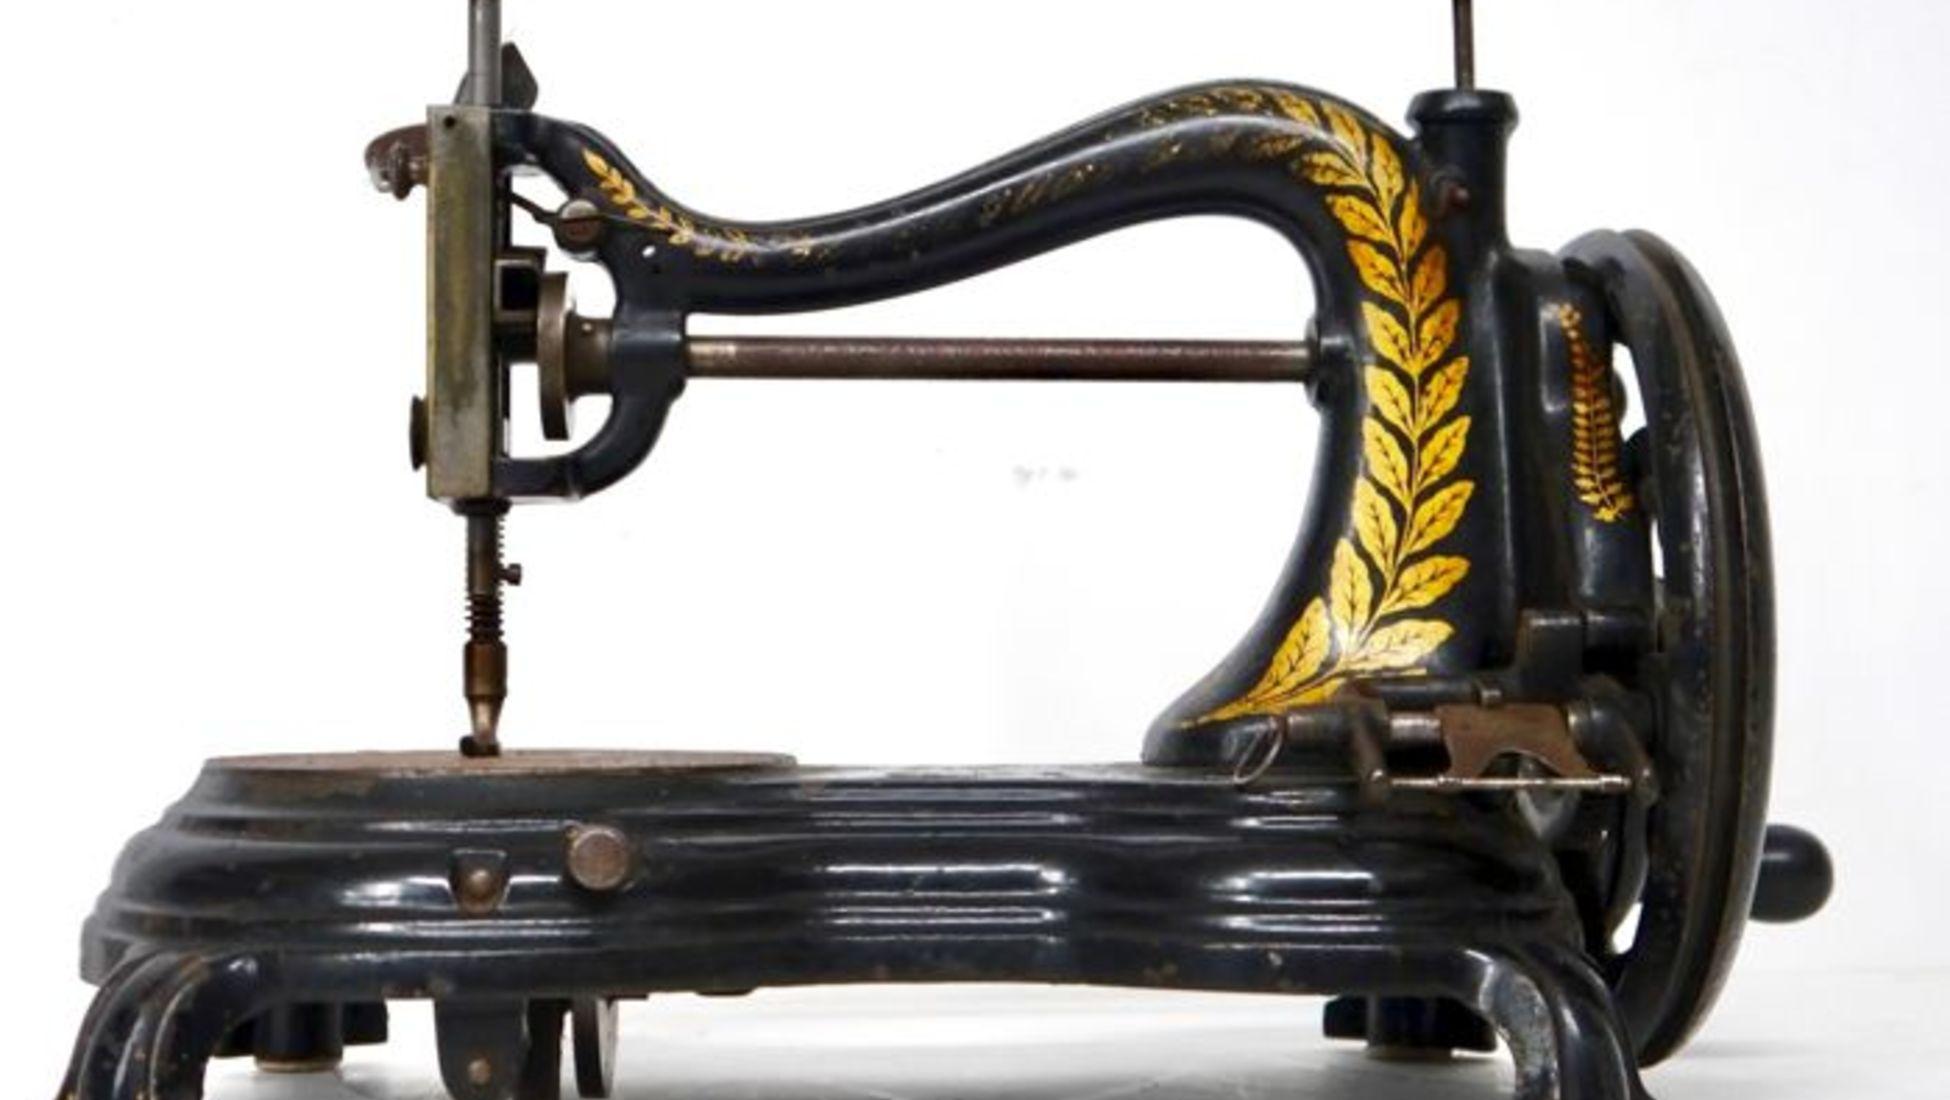 668ff639e Máquina de costura antiga - Século XIX - 555 € Fabricada no século XIX